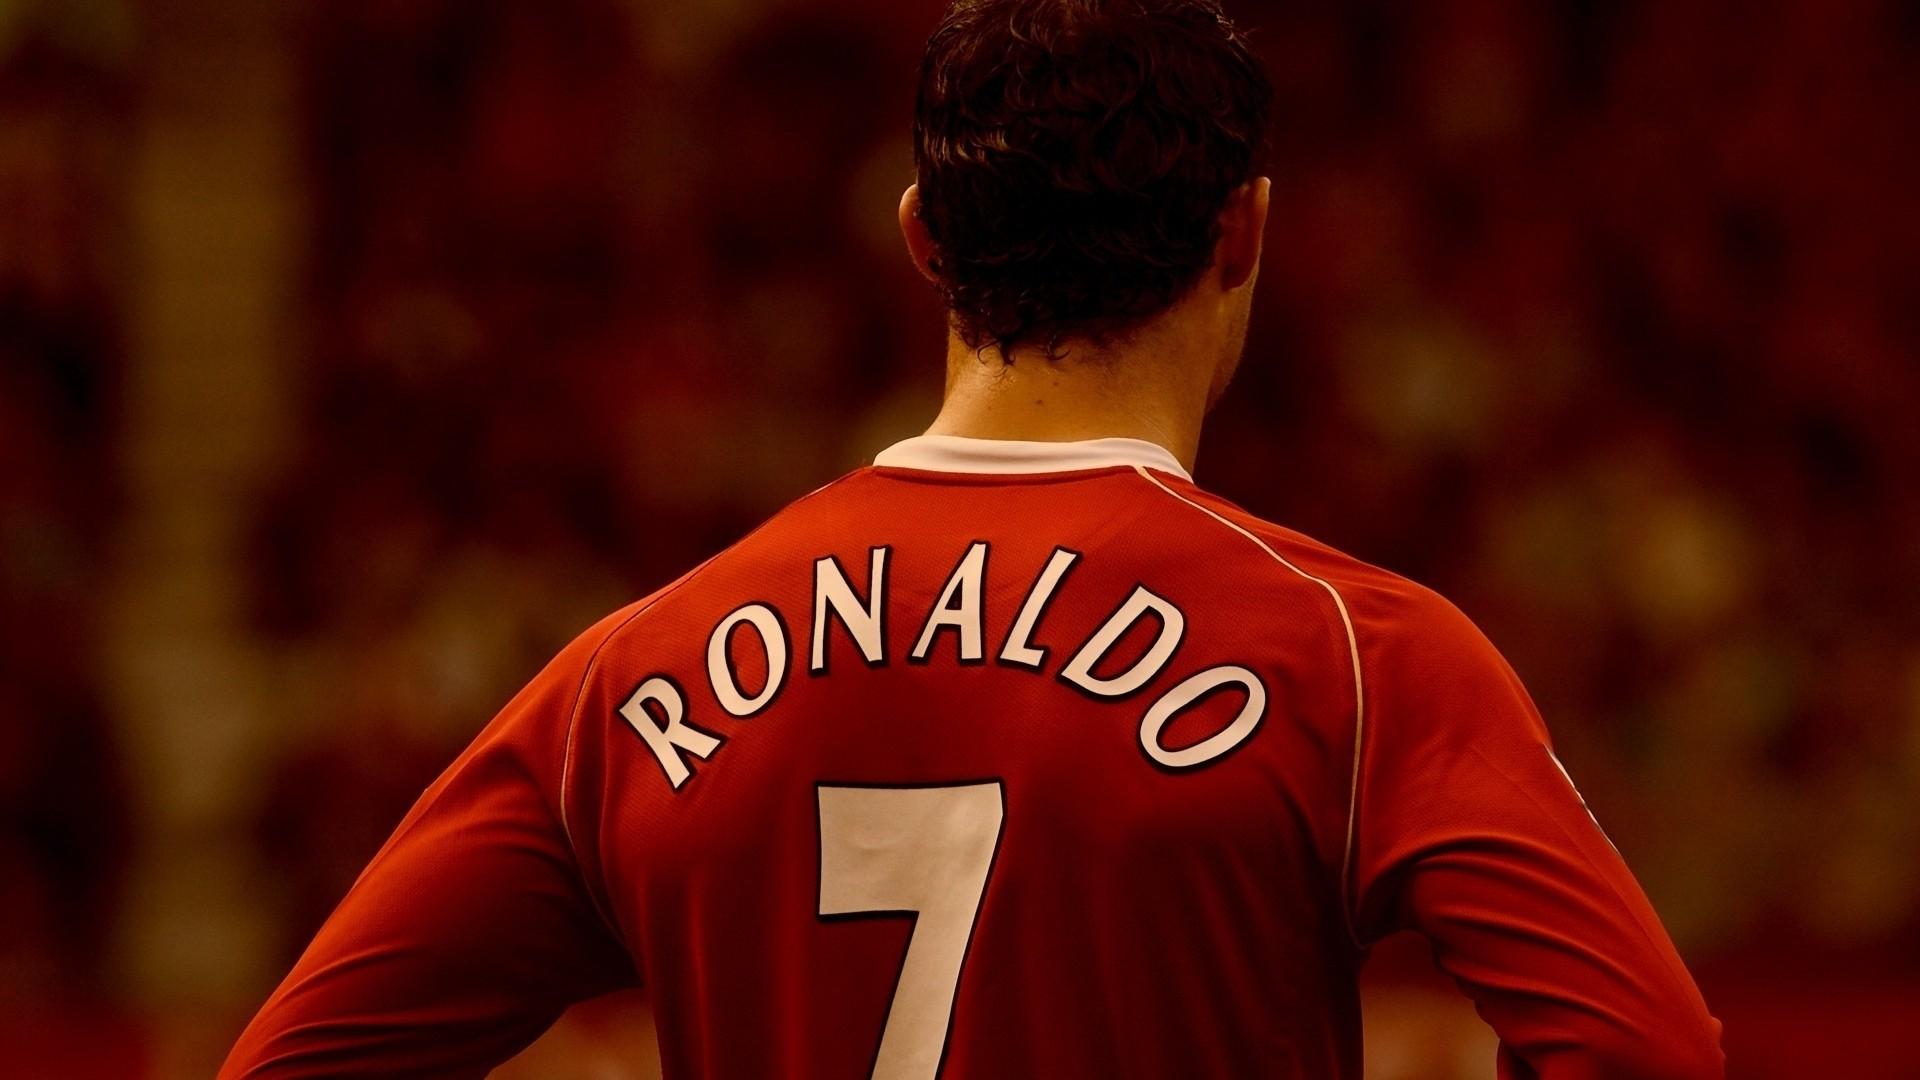 … Background Full HD 1080p. Wallpaper ronaldo, back, form,  football